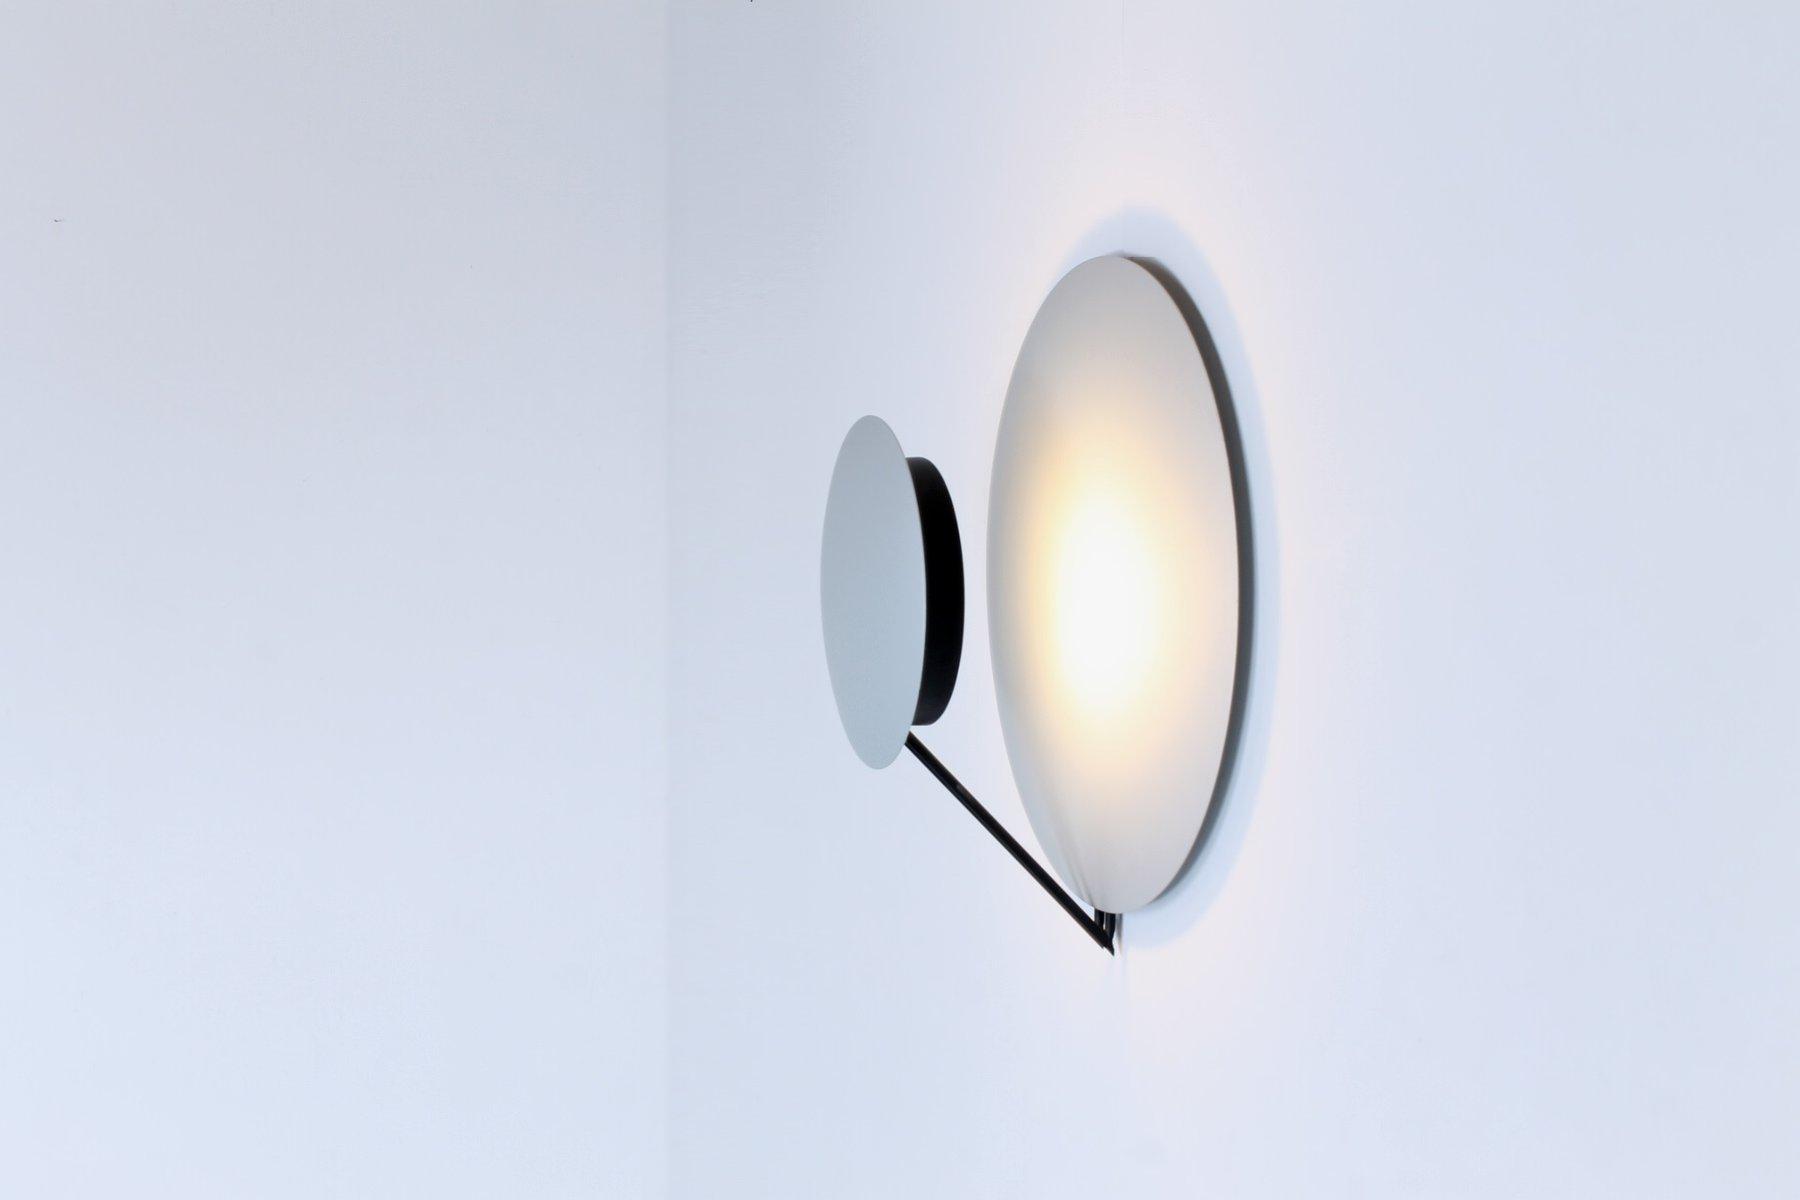 italian aluminium vega sconces by cesaro amico for tre. Black Bedroom Furniture Sets. Home Design Ideas